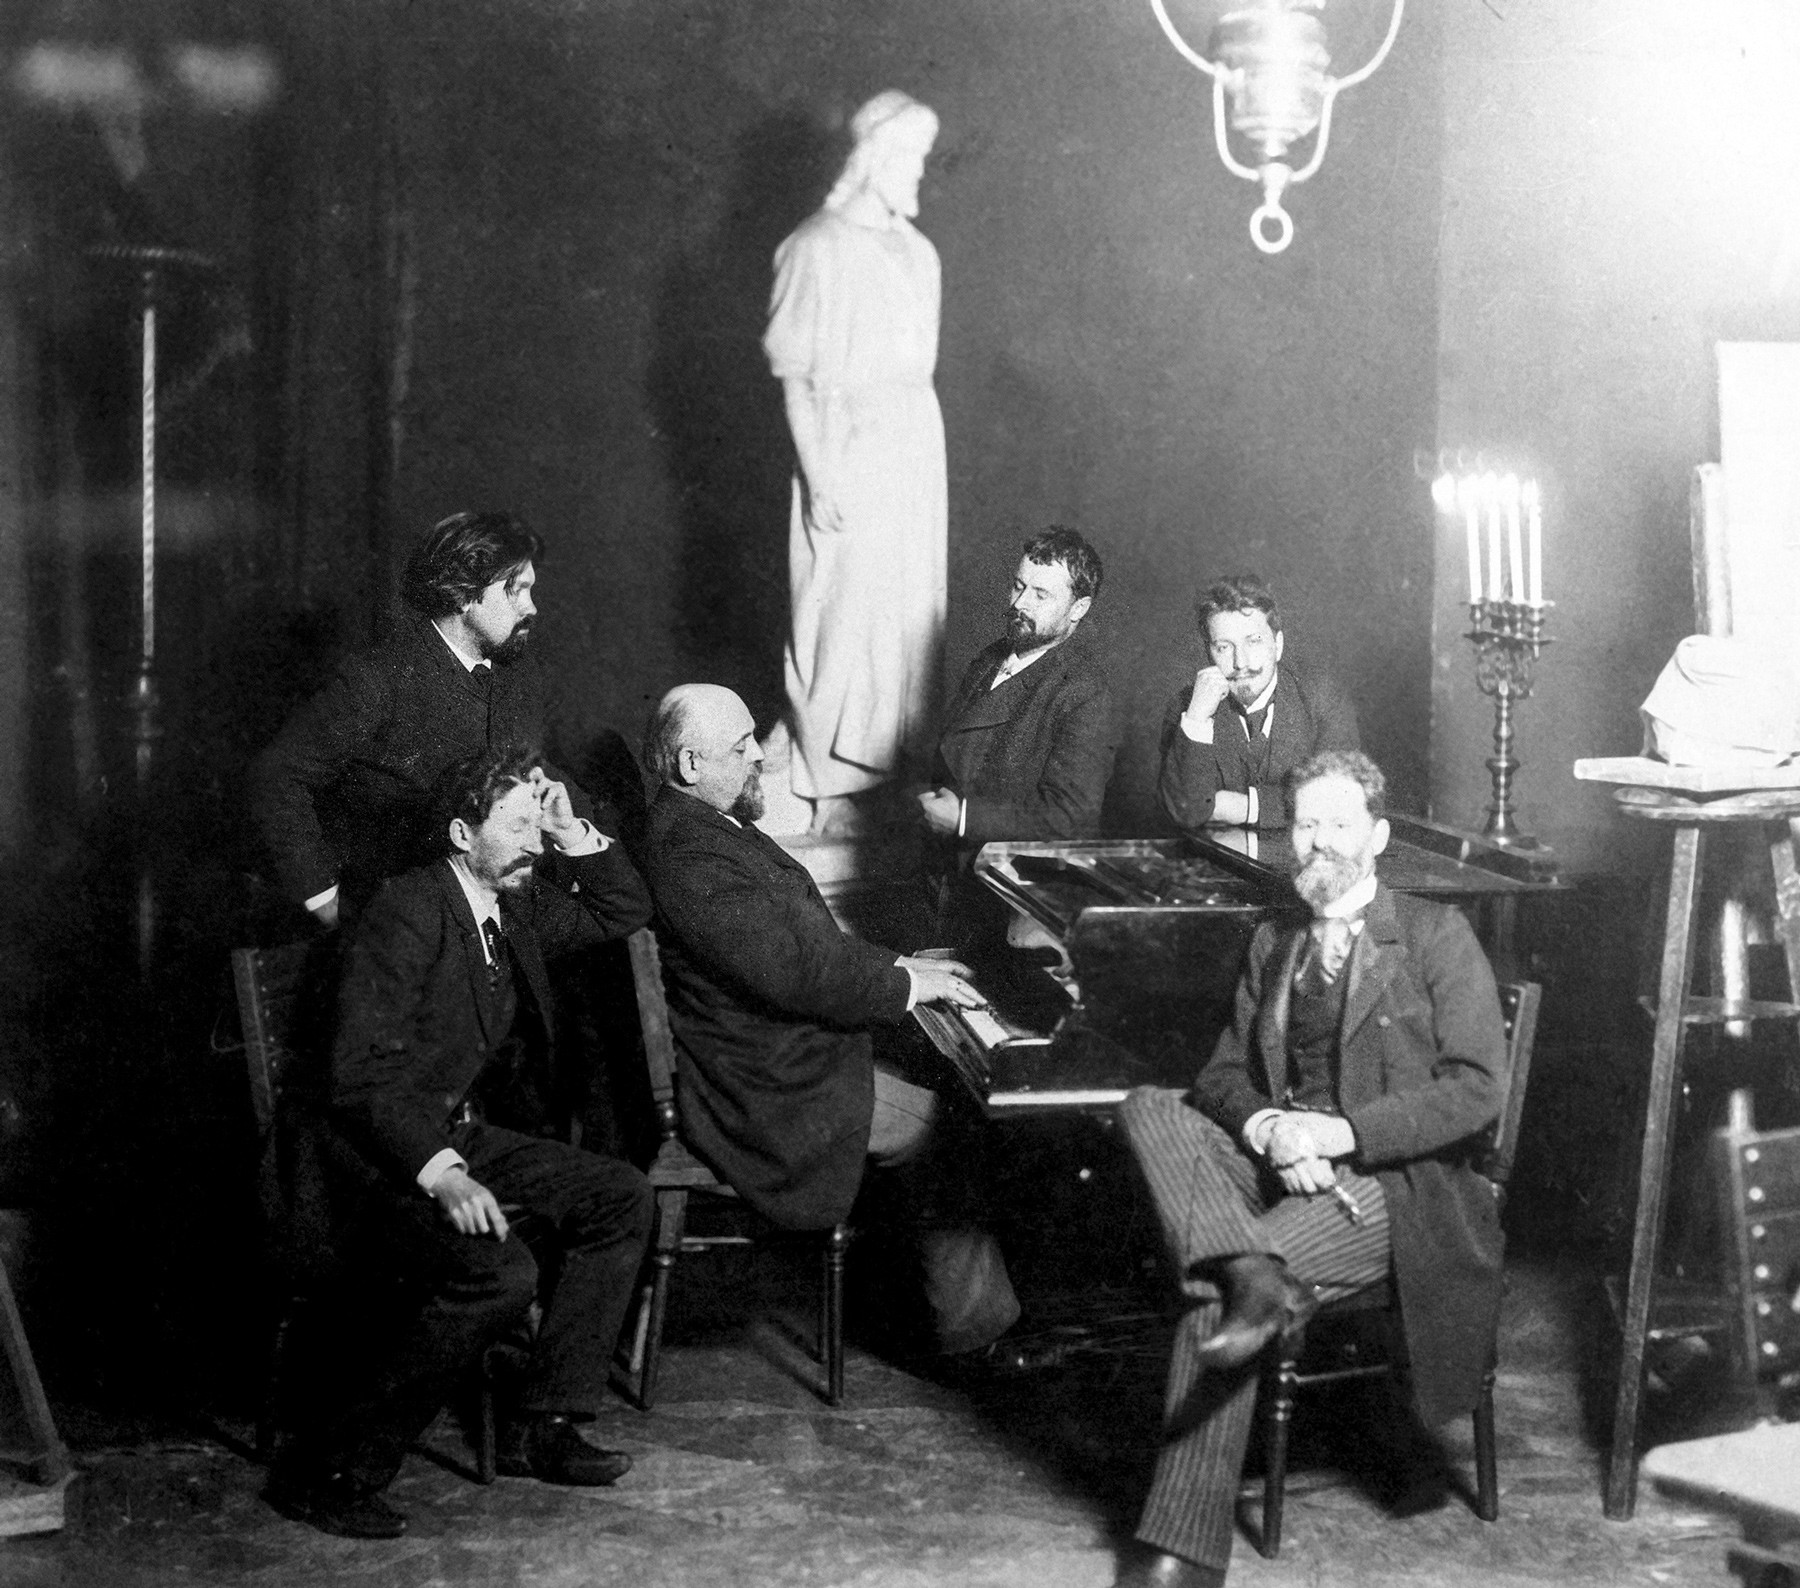 Os artistas Iliá Répin, Vassíli Súrikov, Konstantin Korôvin, Valentín Seróv e Mark Antokolski em Abrâmtsevo. / Foto do Museu de História e Reconstrução de Moscou